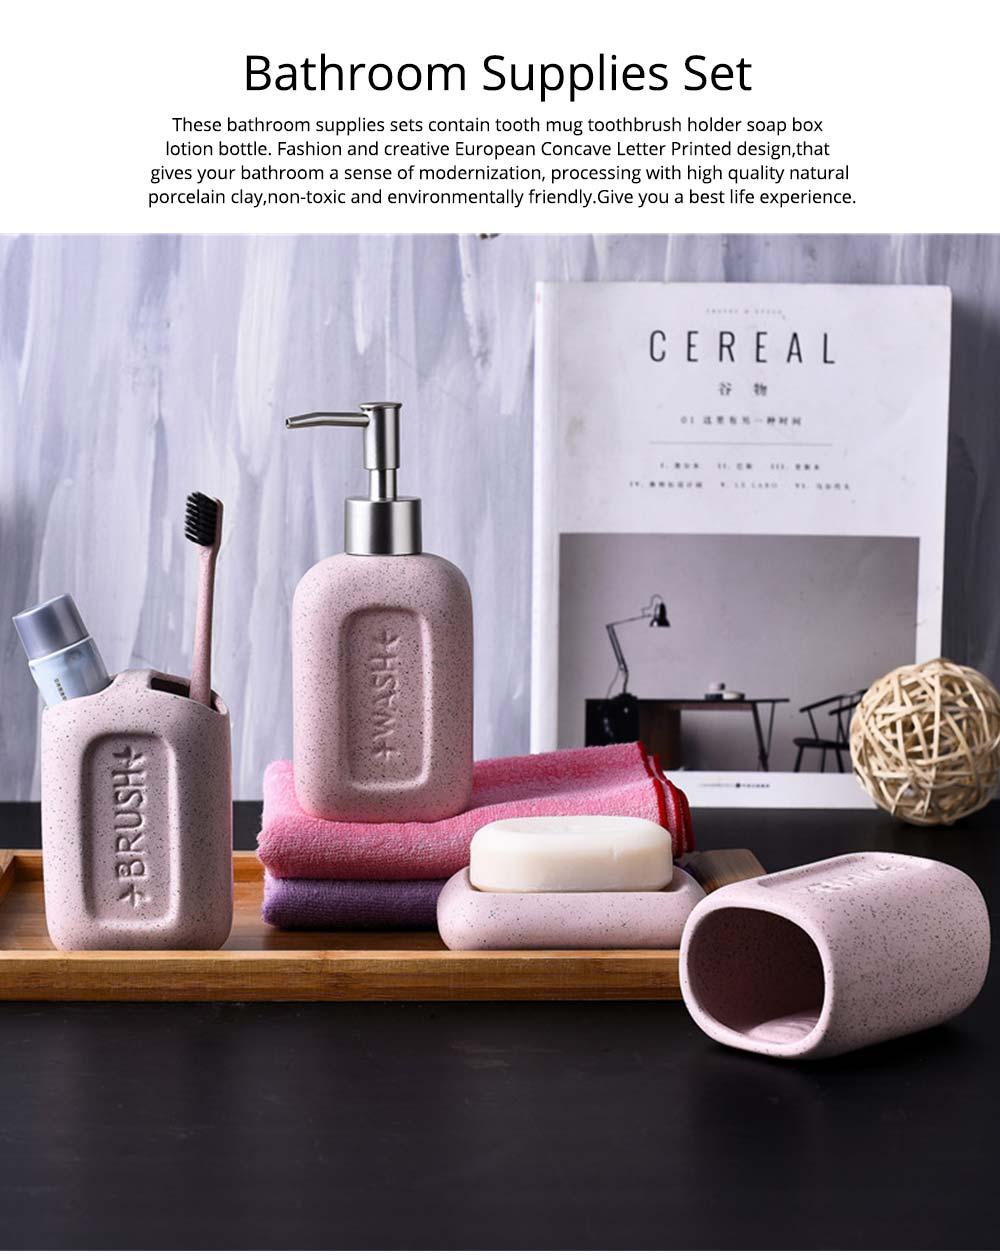 Creative European Ceramic Bathroom Supplies 4 pieces Set Concave Letter Printed Sanitary Ware 0